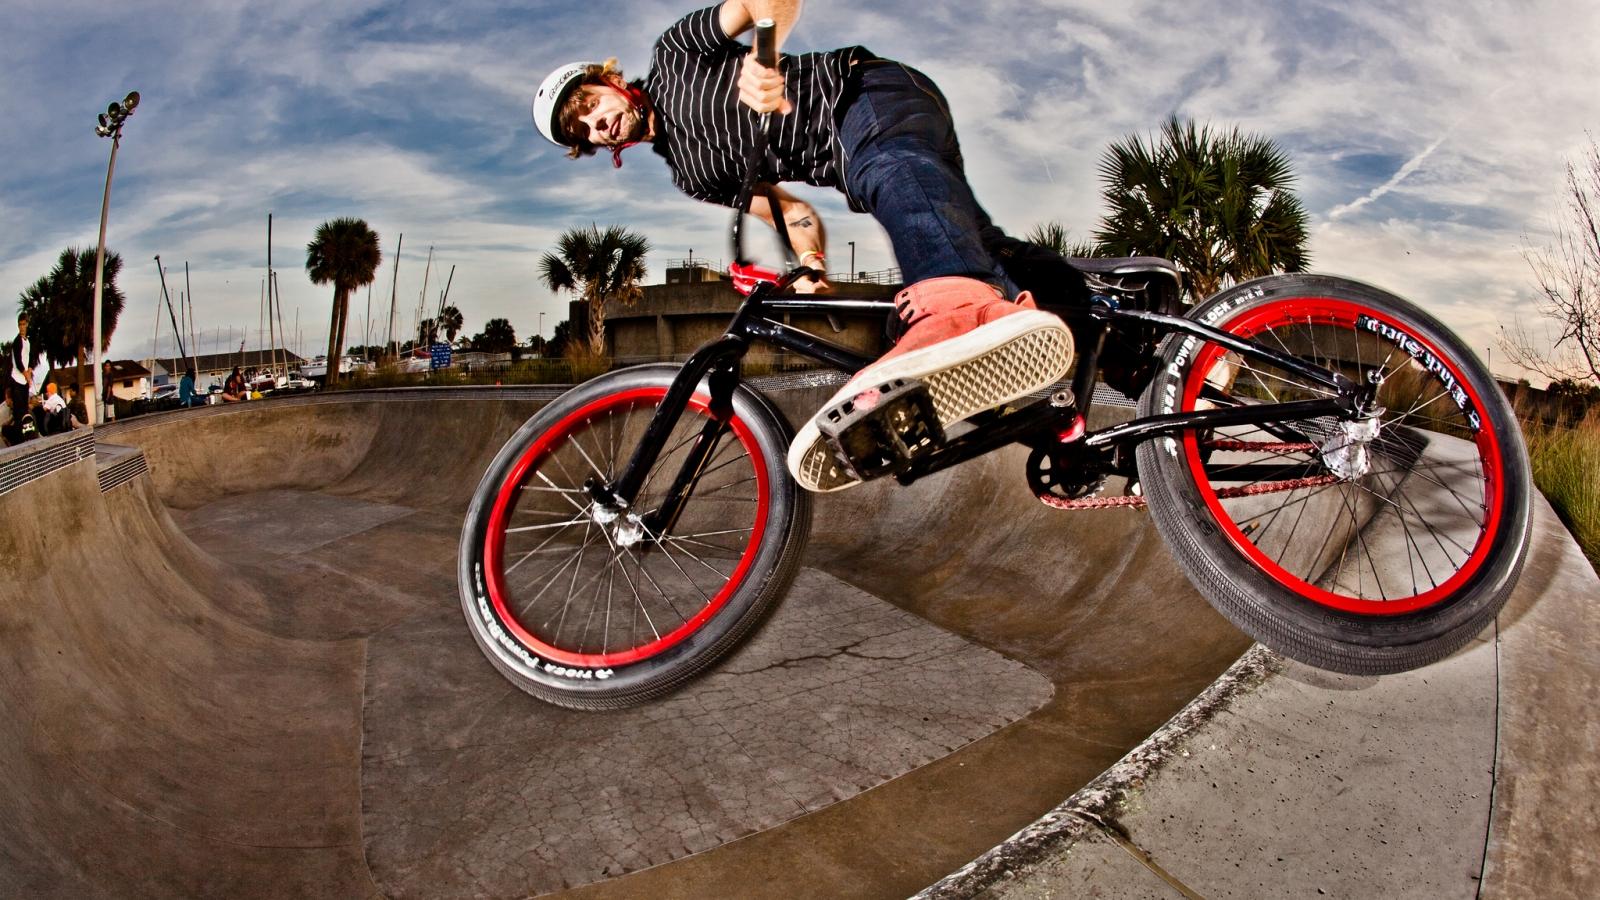 BMX en un Skatepark - 1600x900